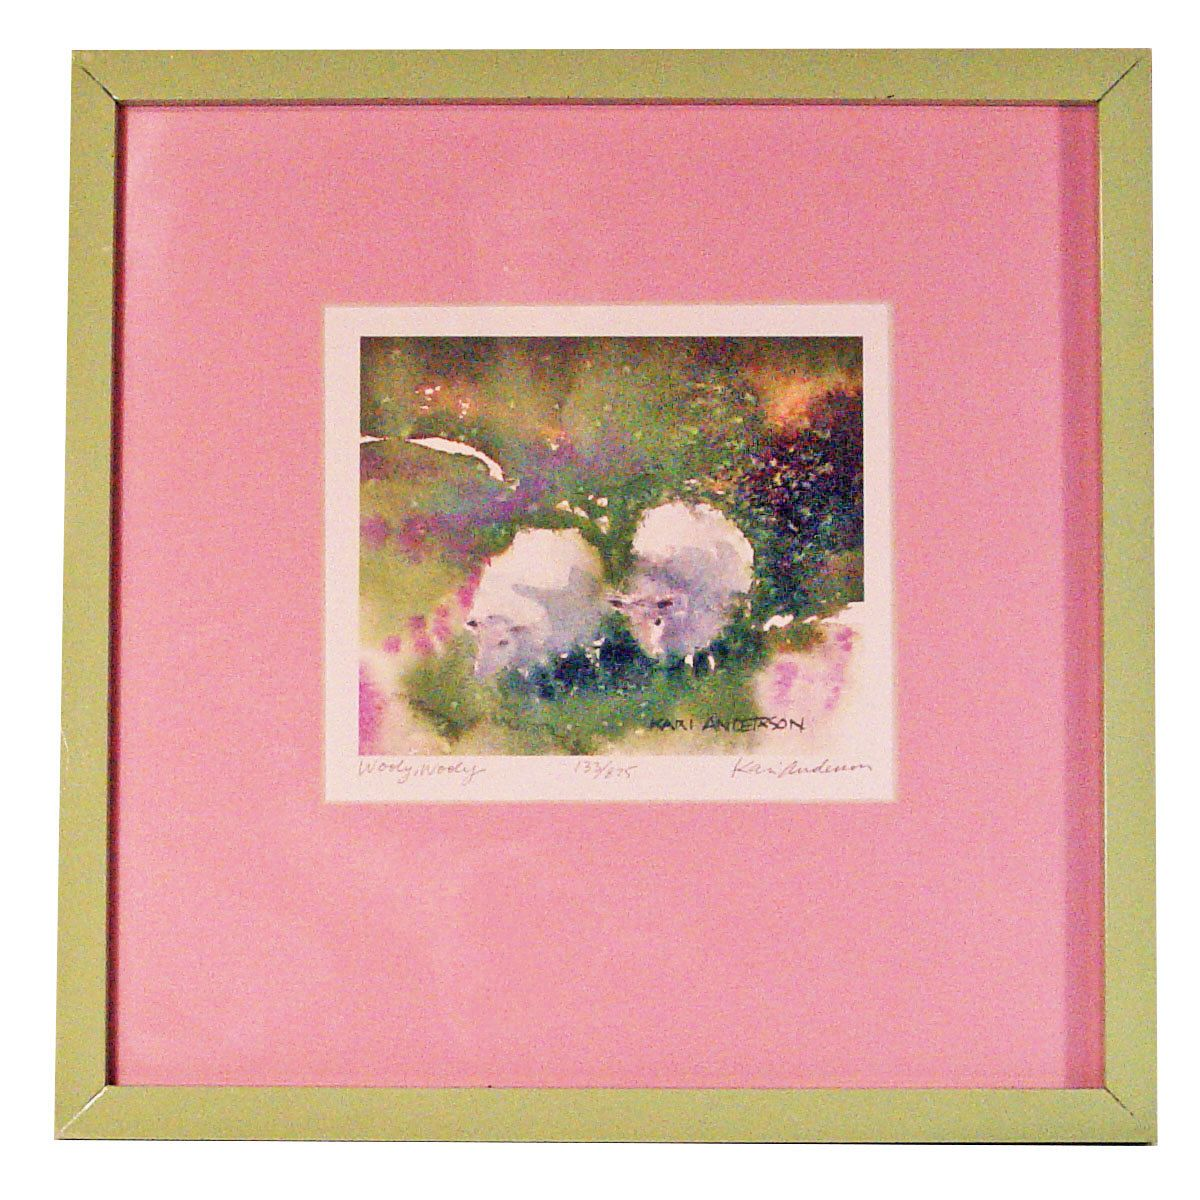 Kari Anderson signed & numbered Watercolor Framed Print \